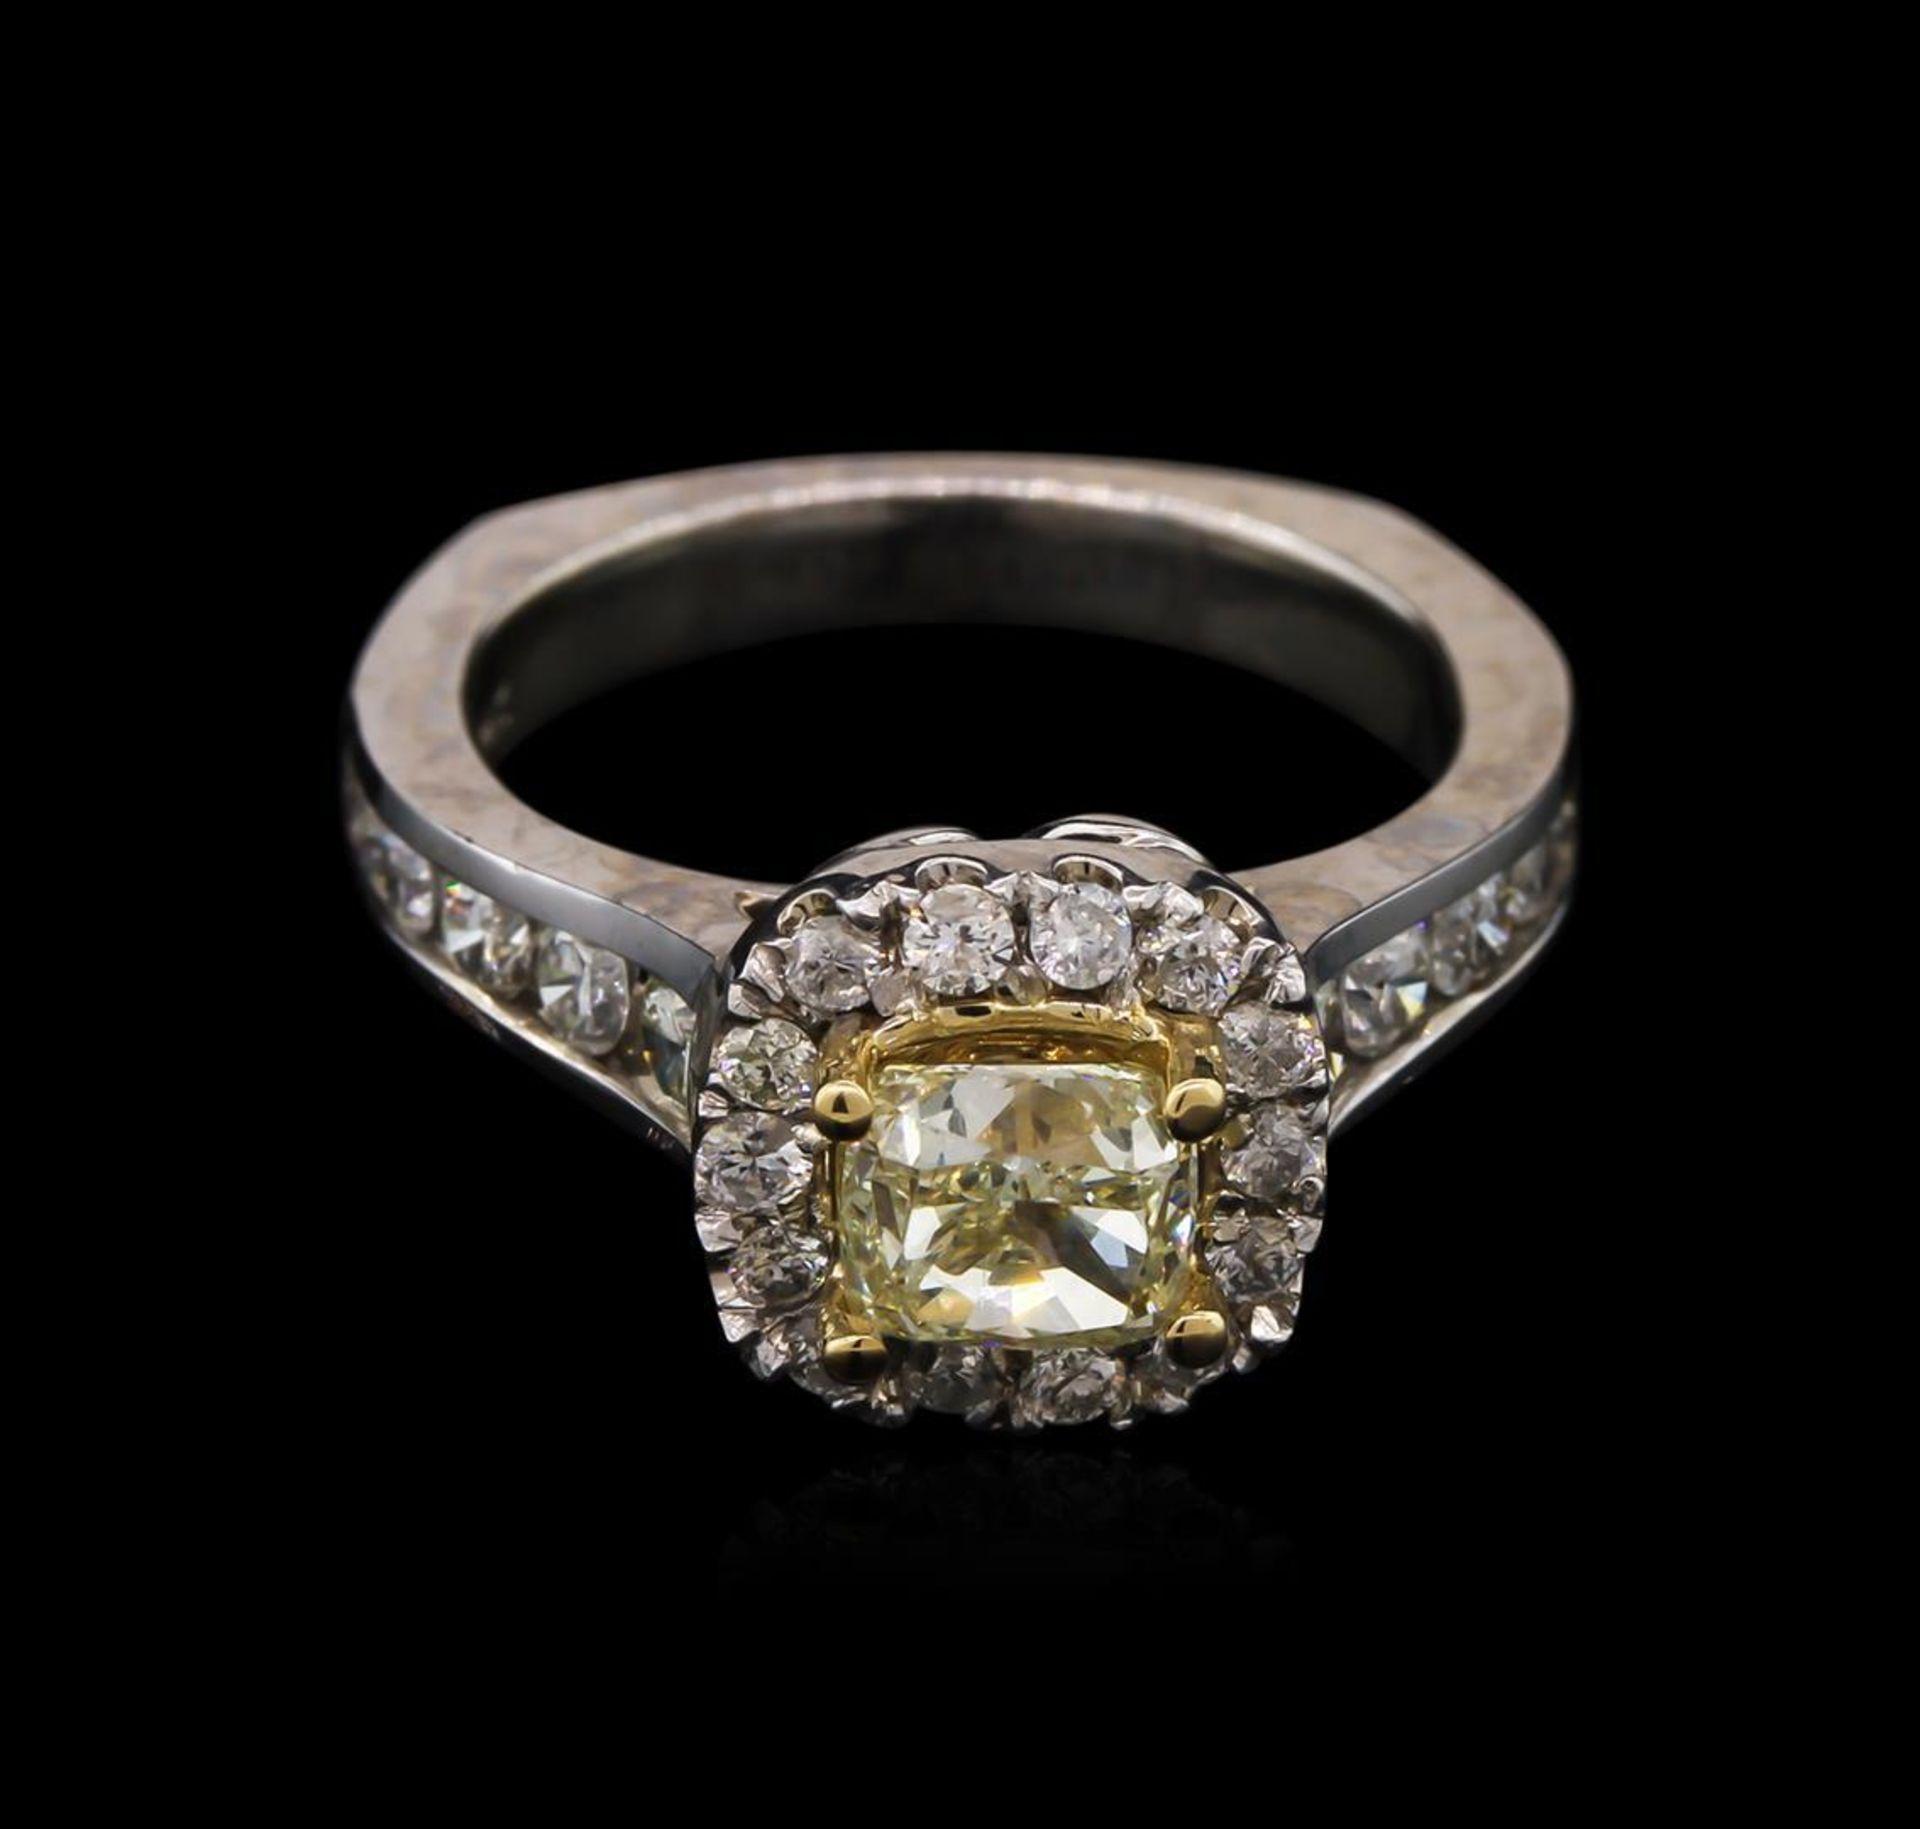 2.07 ctw Light Yellow Diamond Ring - 14KT White Gold - Image 2 of 3